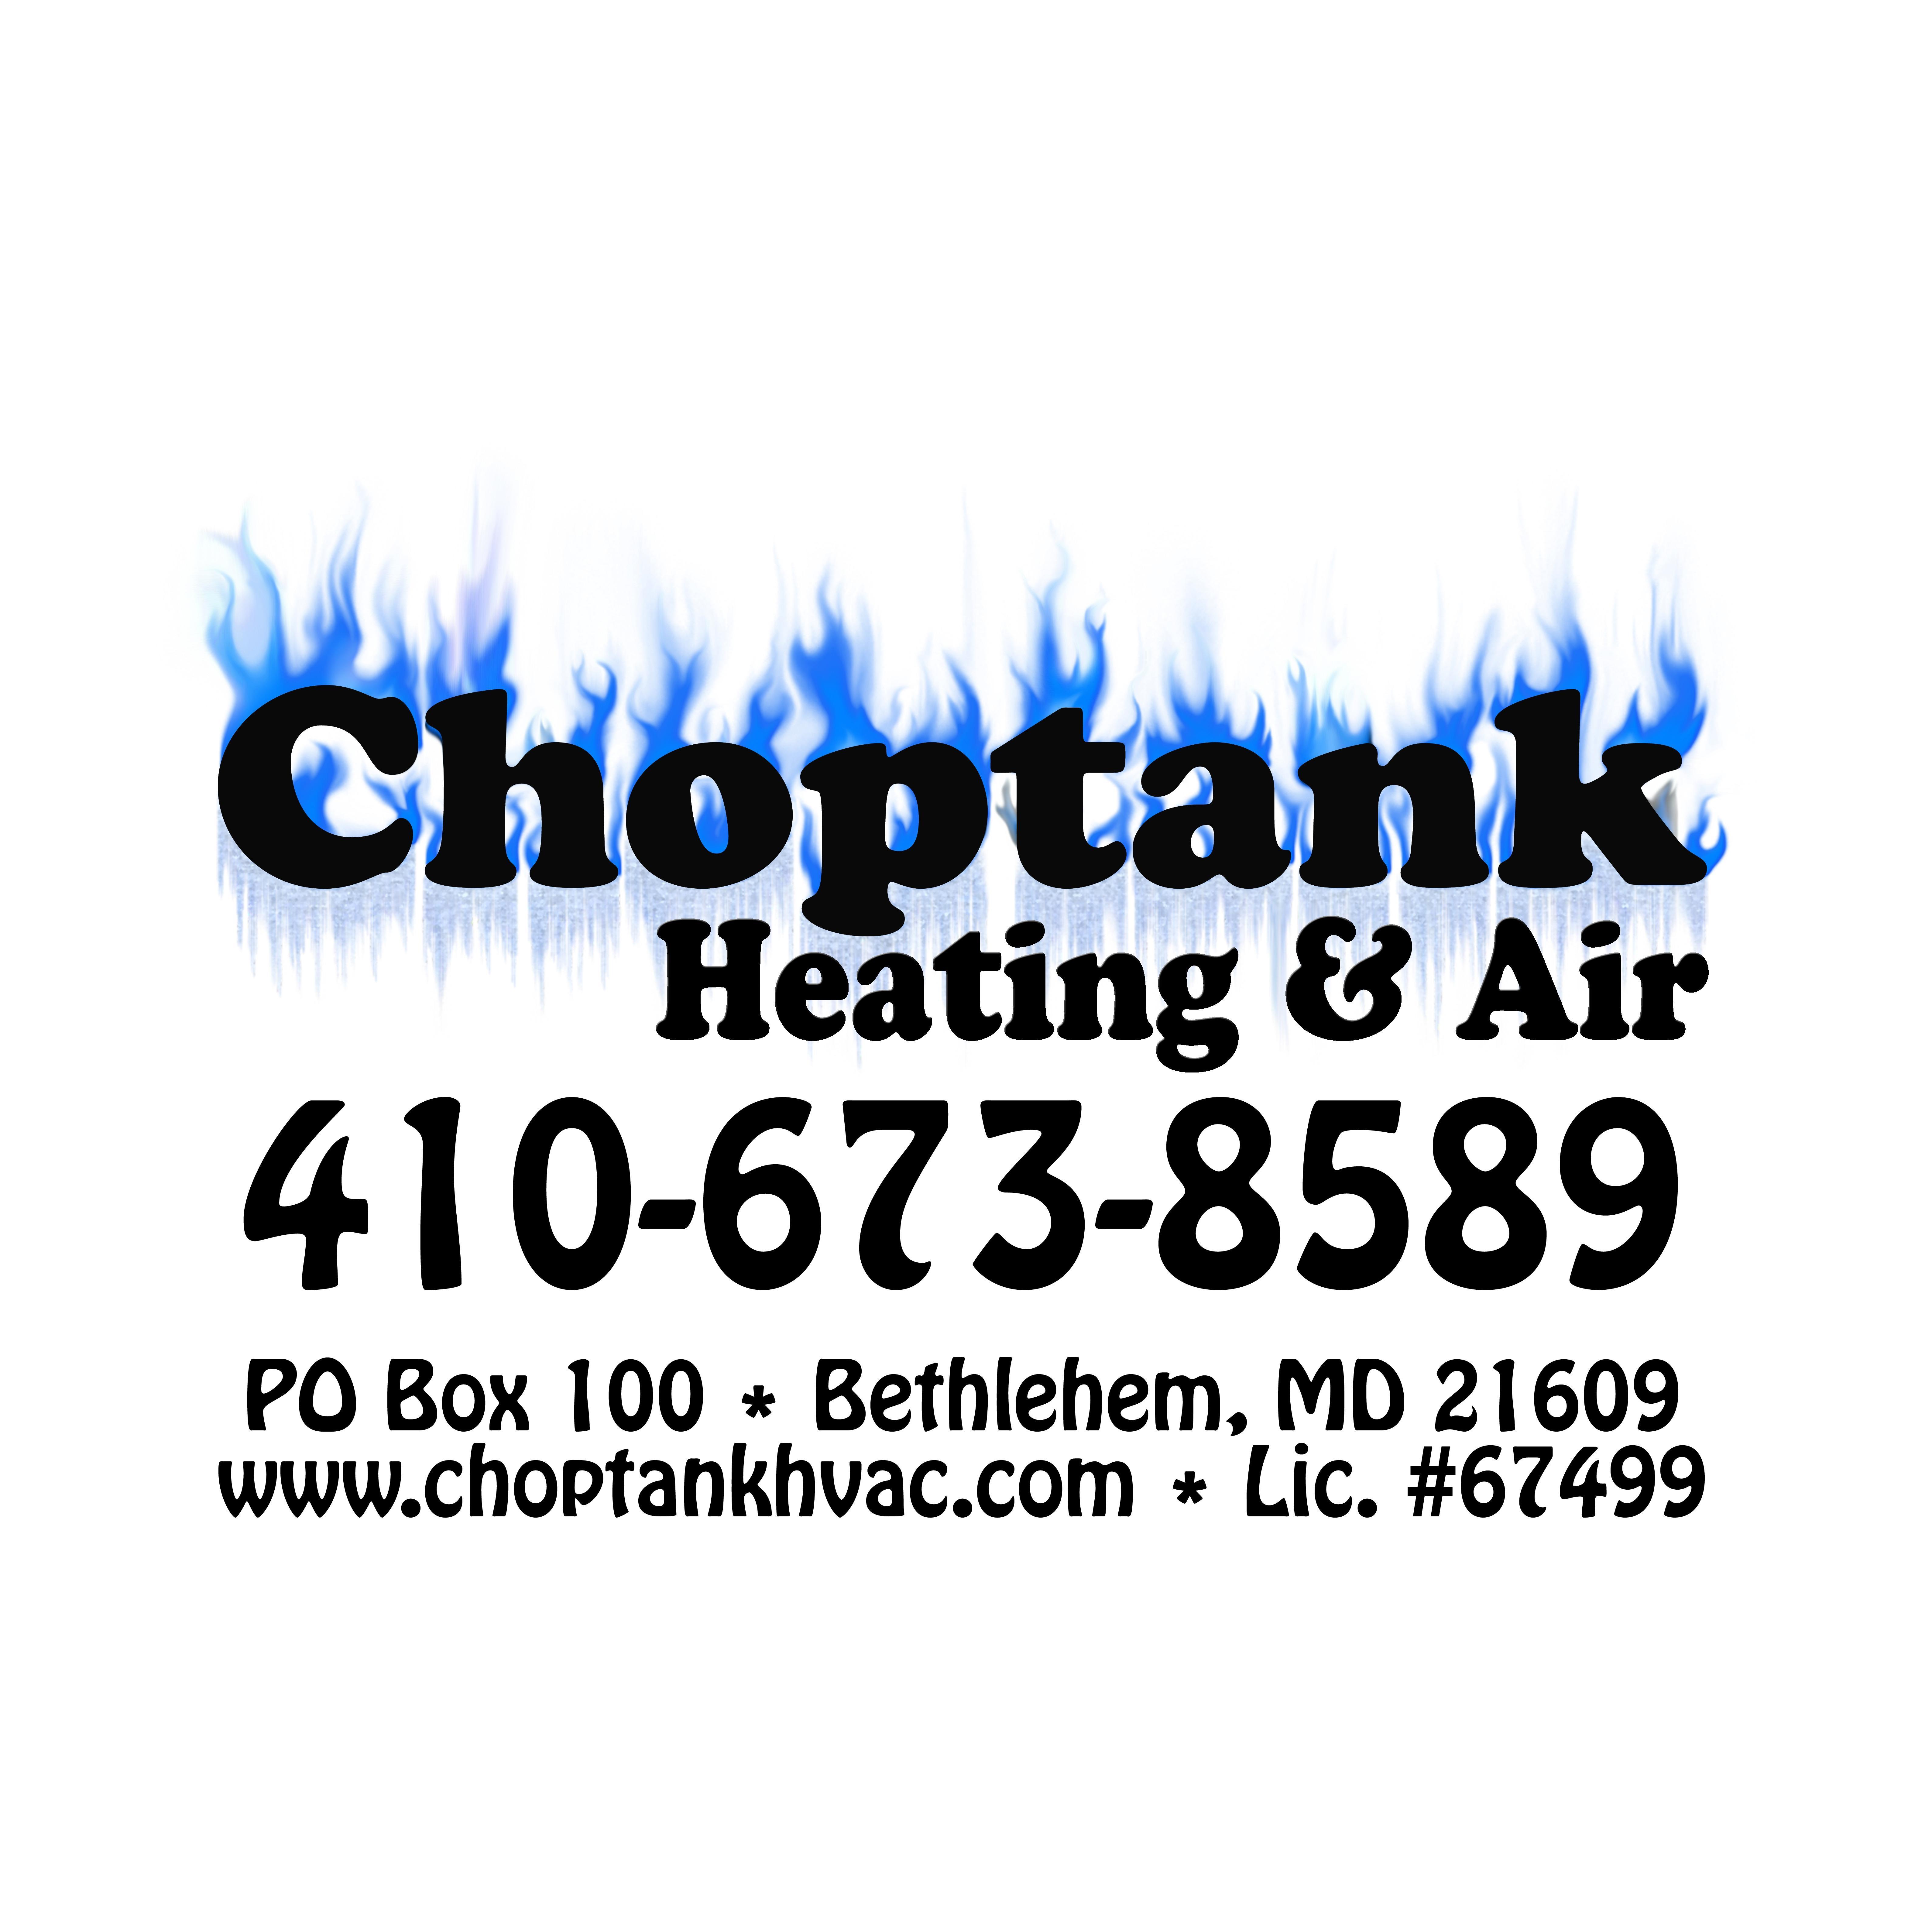 Choptank Heating and Air - Preston, MD 21655 - (410)673-8589 | ShowMeLocal.com